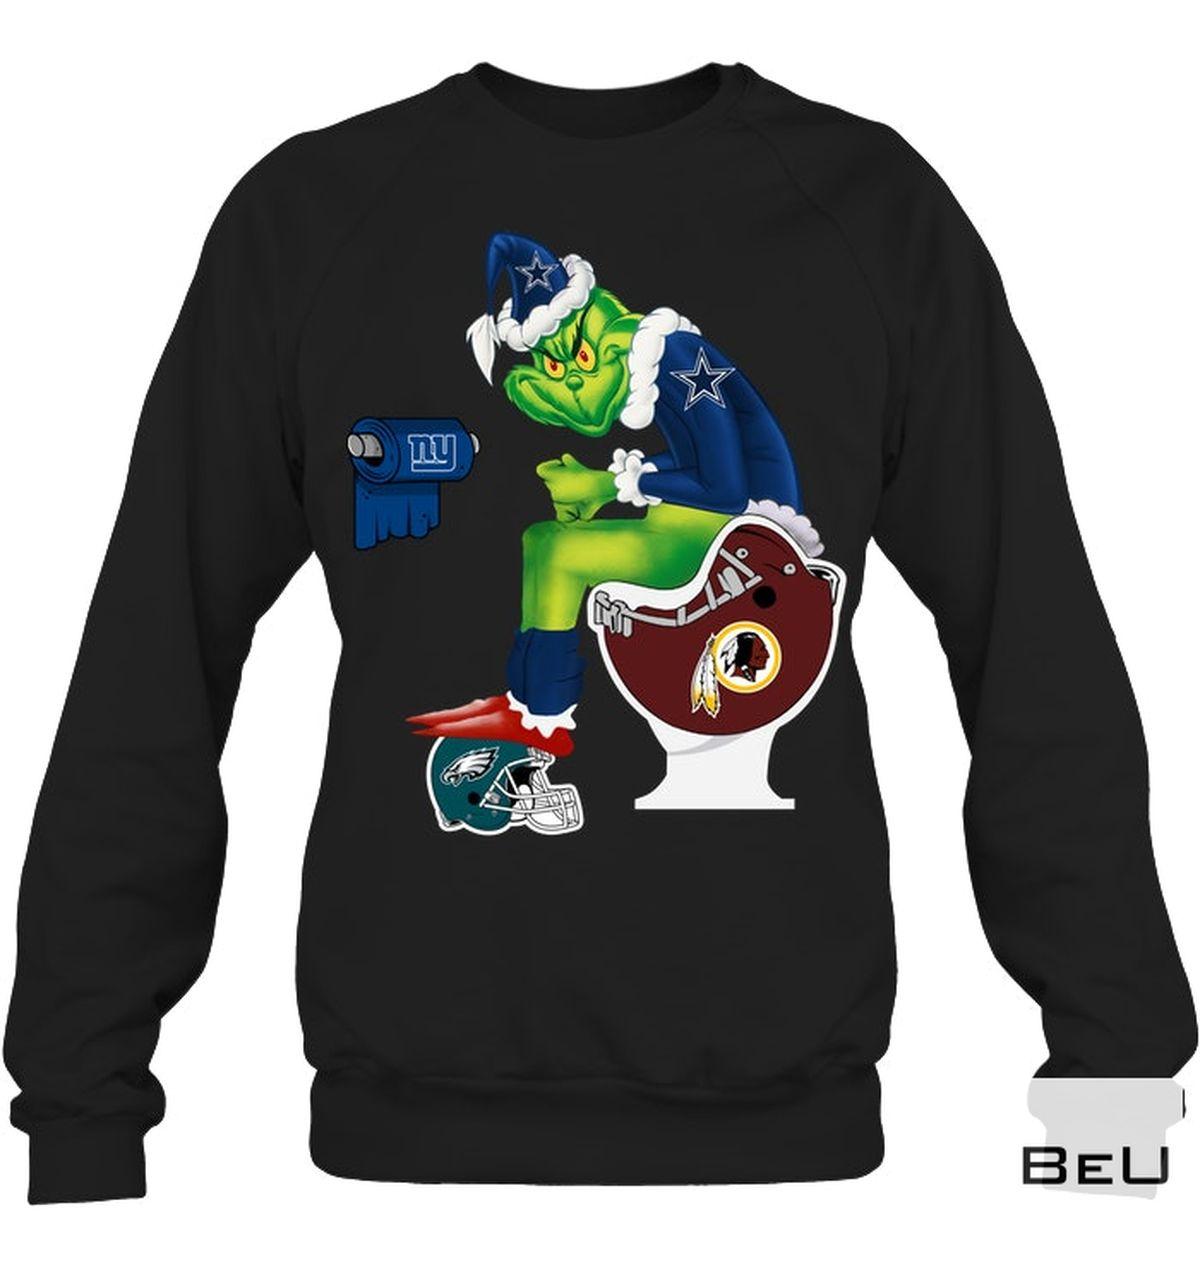 Fantastic The Grinch Christmas Sport Teams Shirt